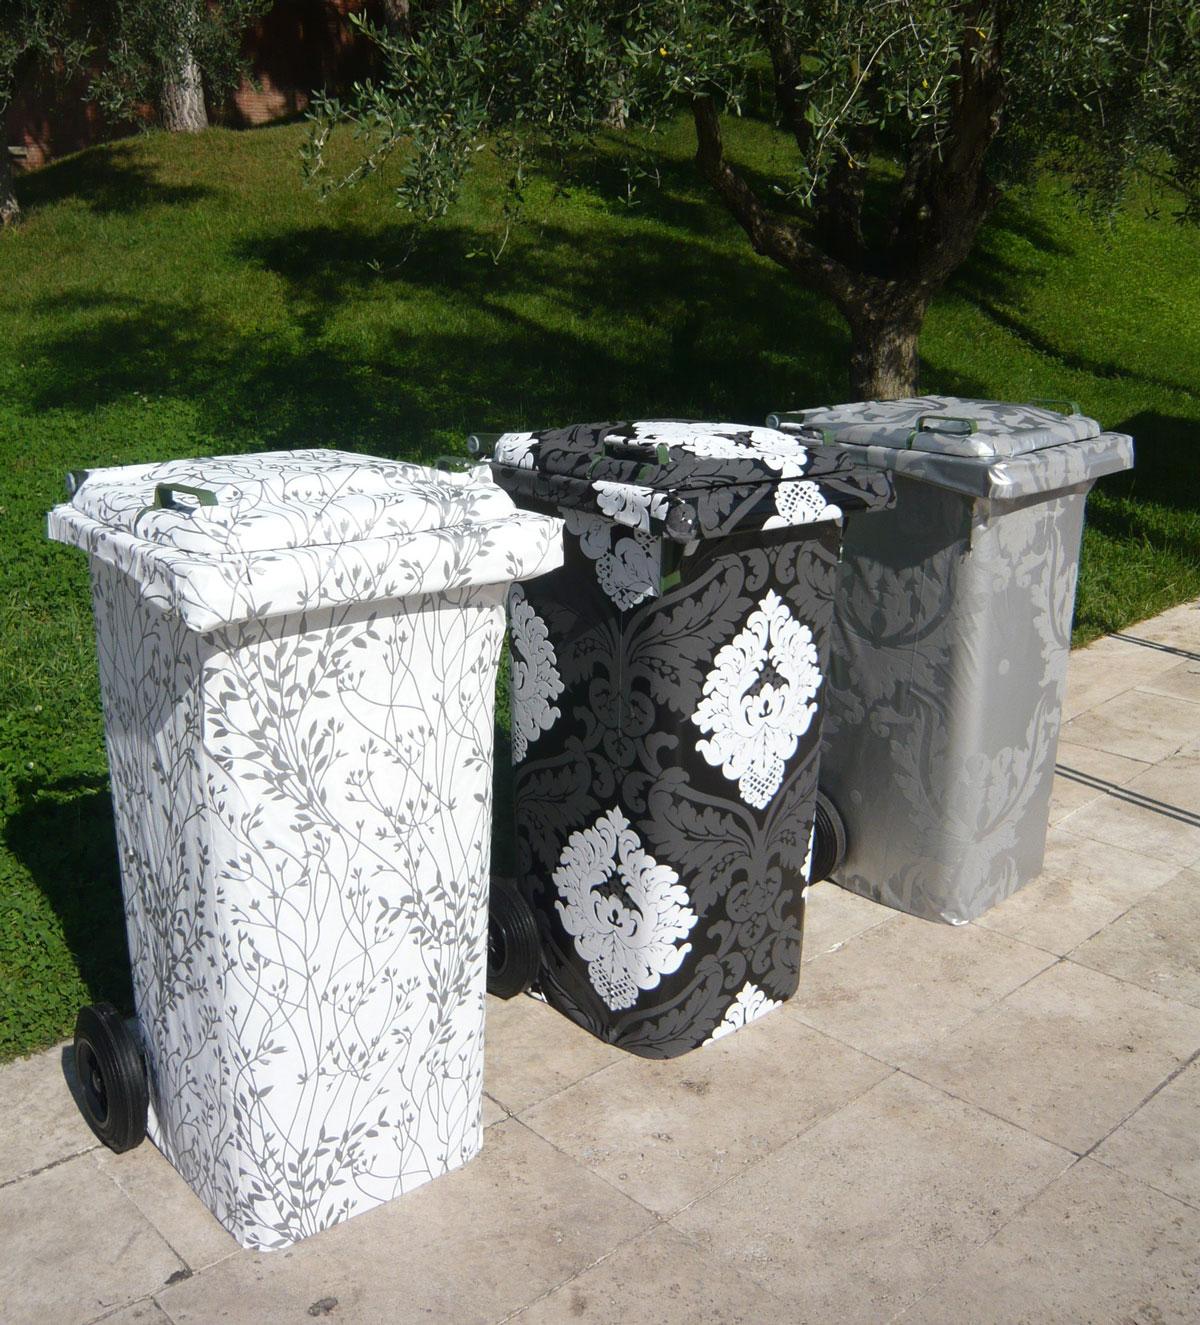 wallpapered-dumpsters-c-finley.jpg